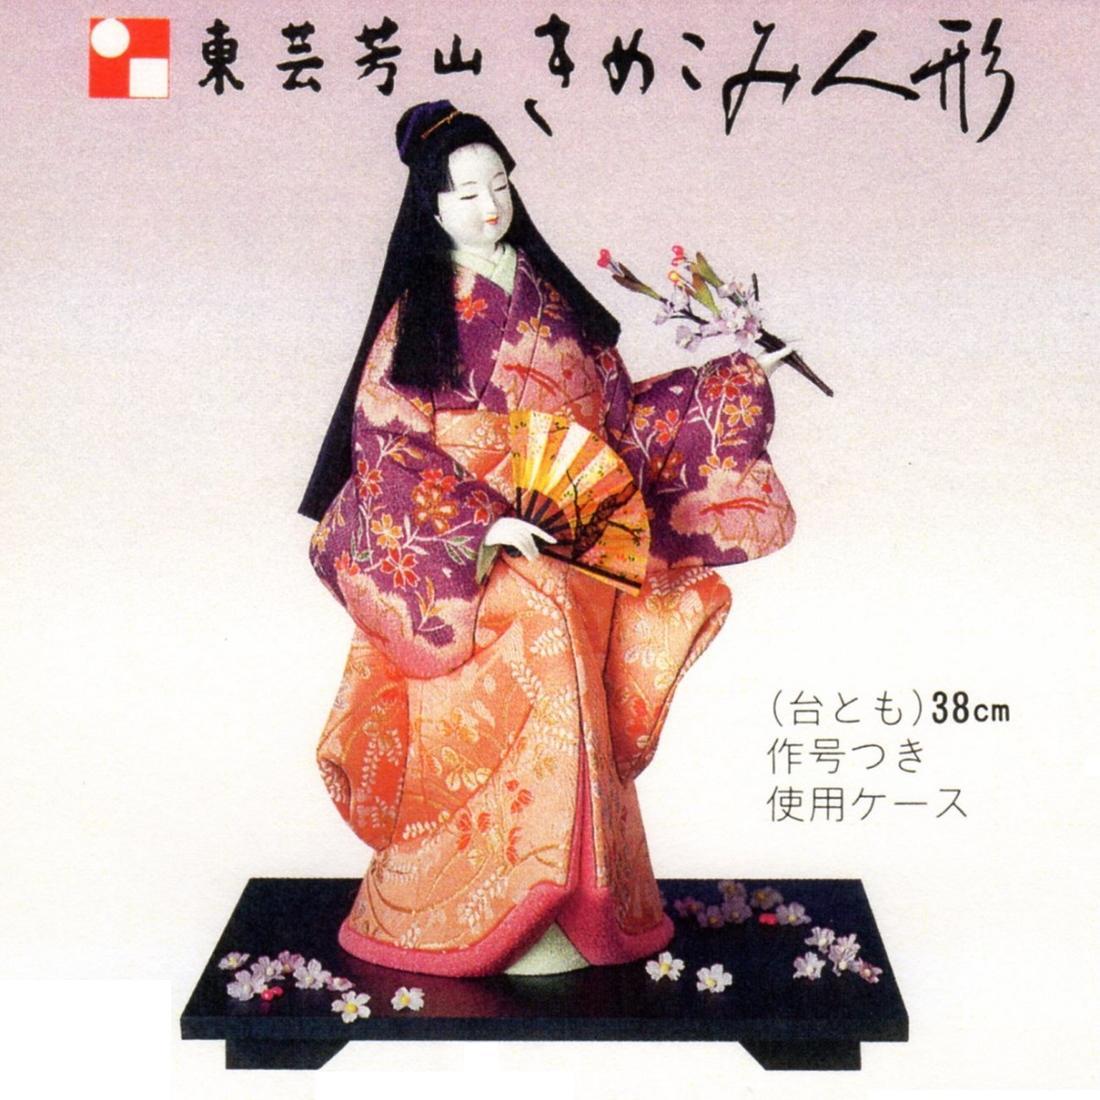 東芸 木目込人形キット「立姿・華友禅」 S258-15